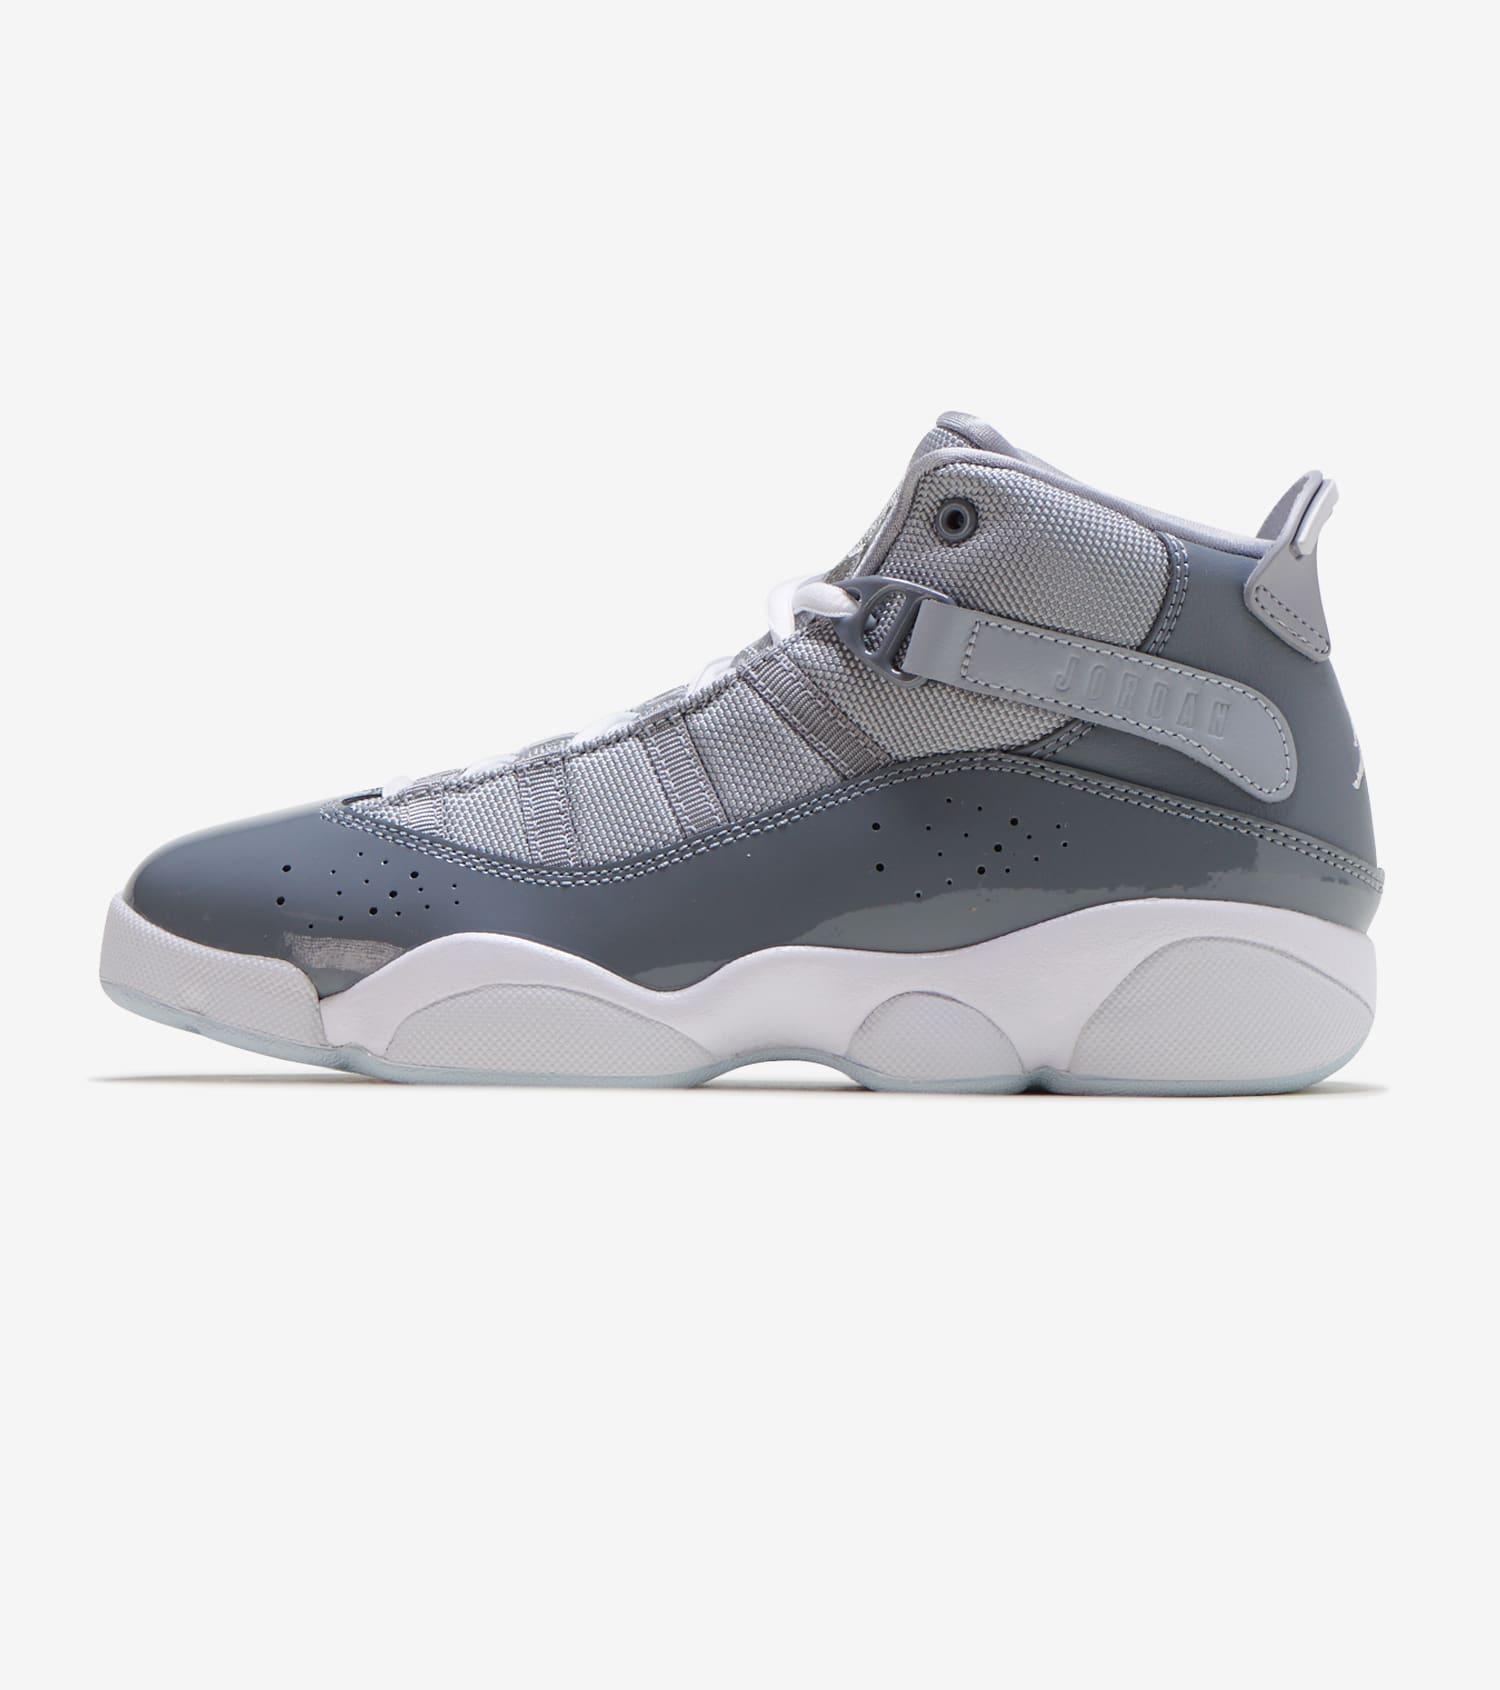 newest c13a2 9c9c6 6 Rings Shoe